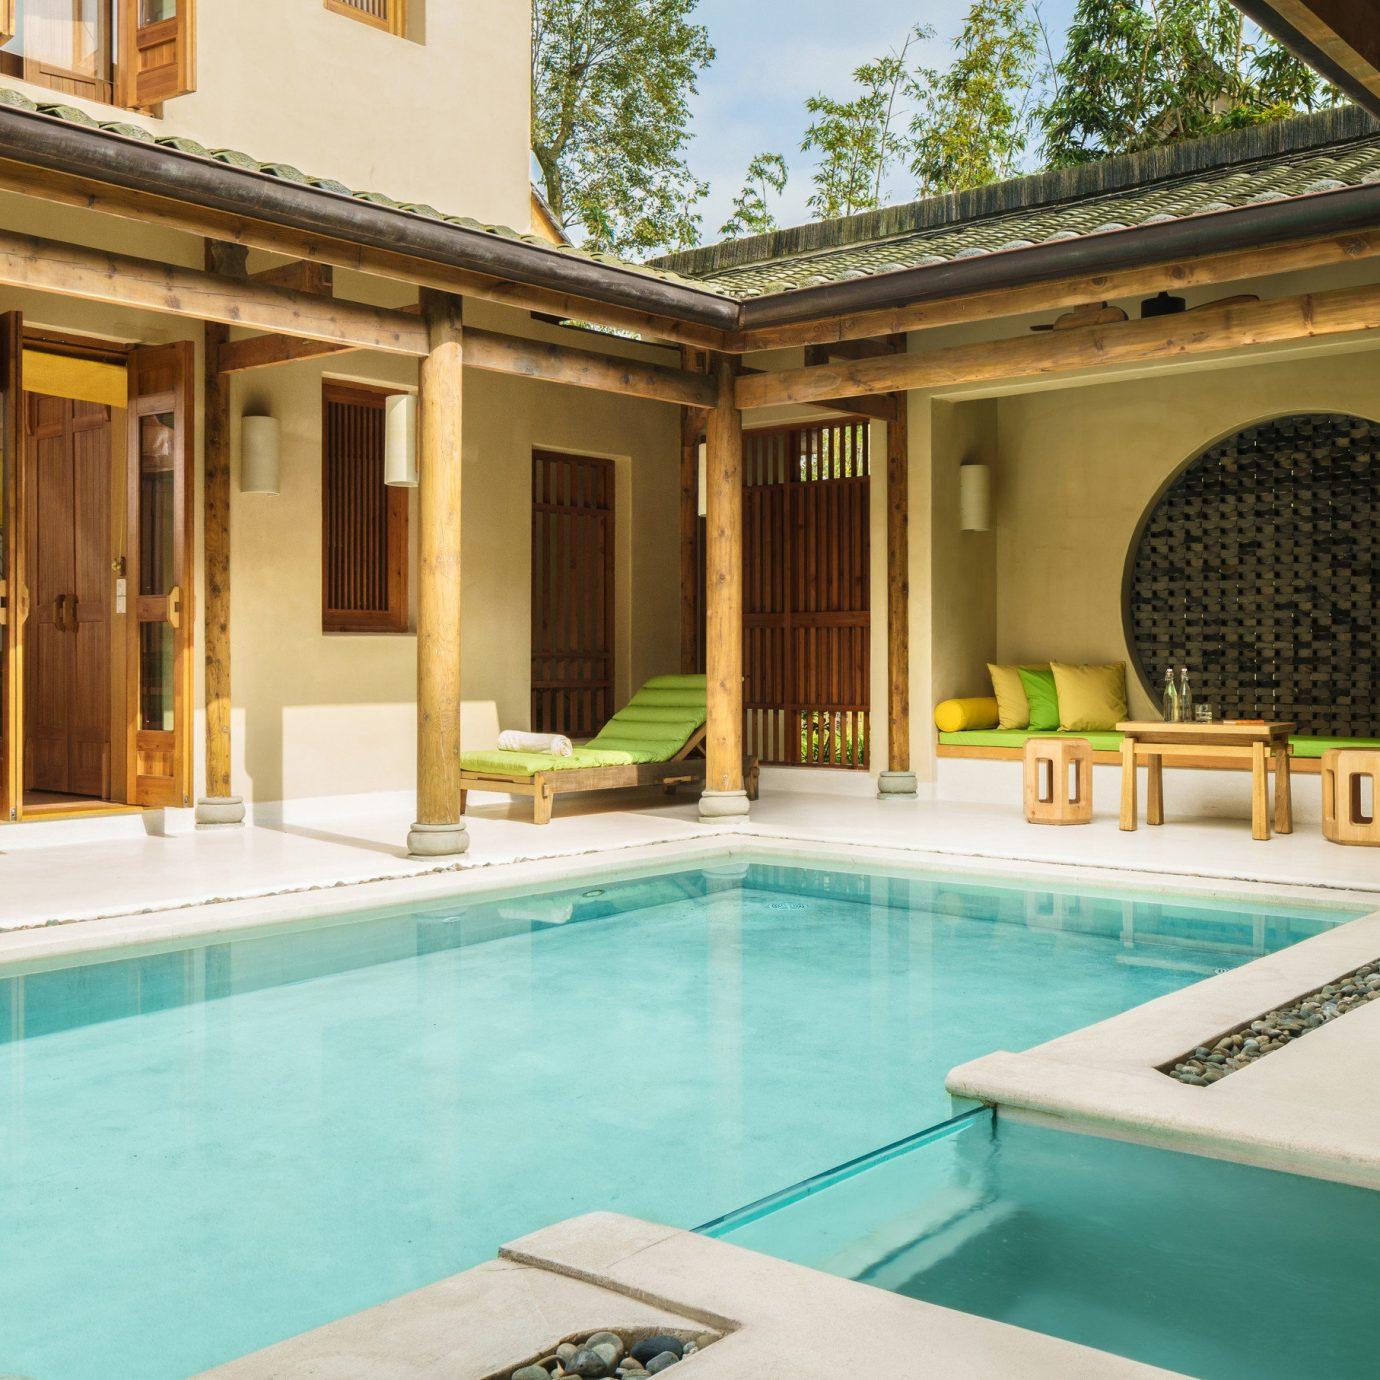 swimming pool property leisure building Resort Villa mansion home palace condominium counter hacienda Island